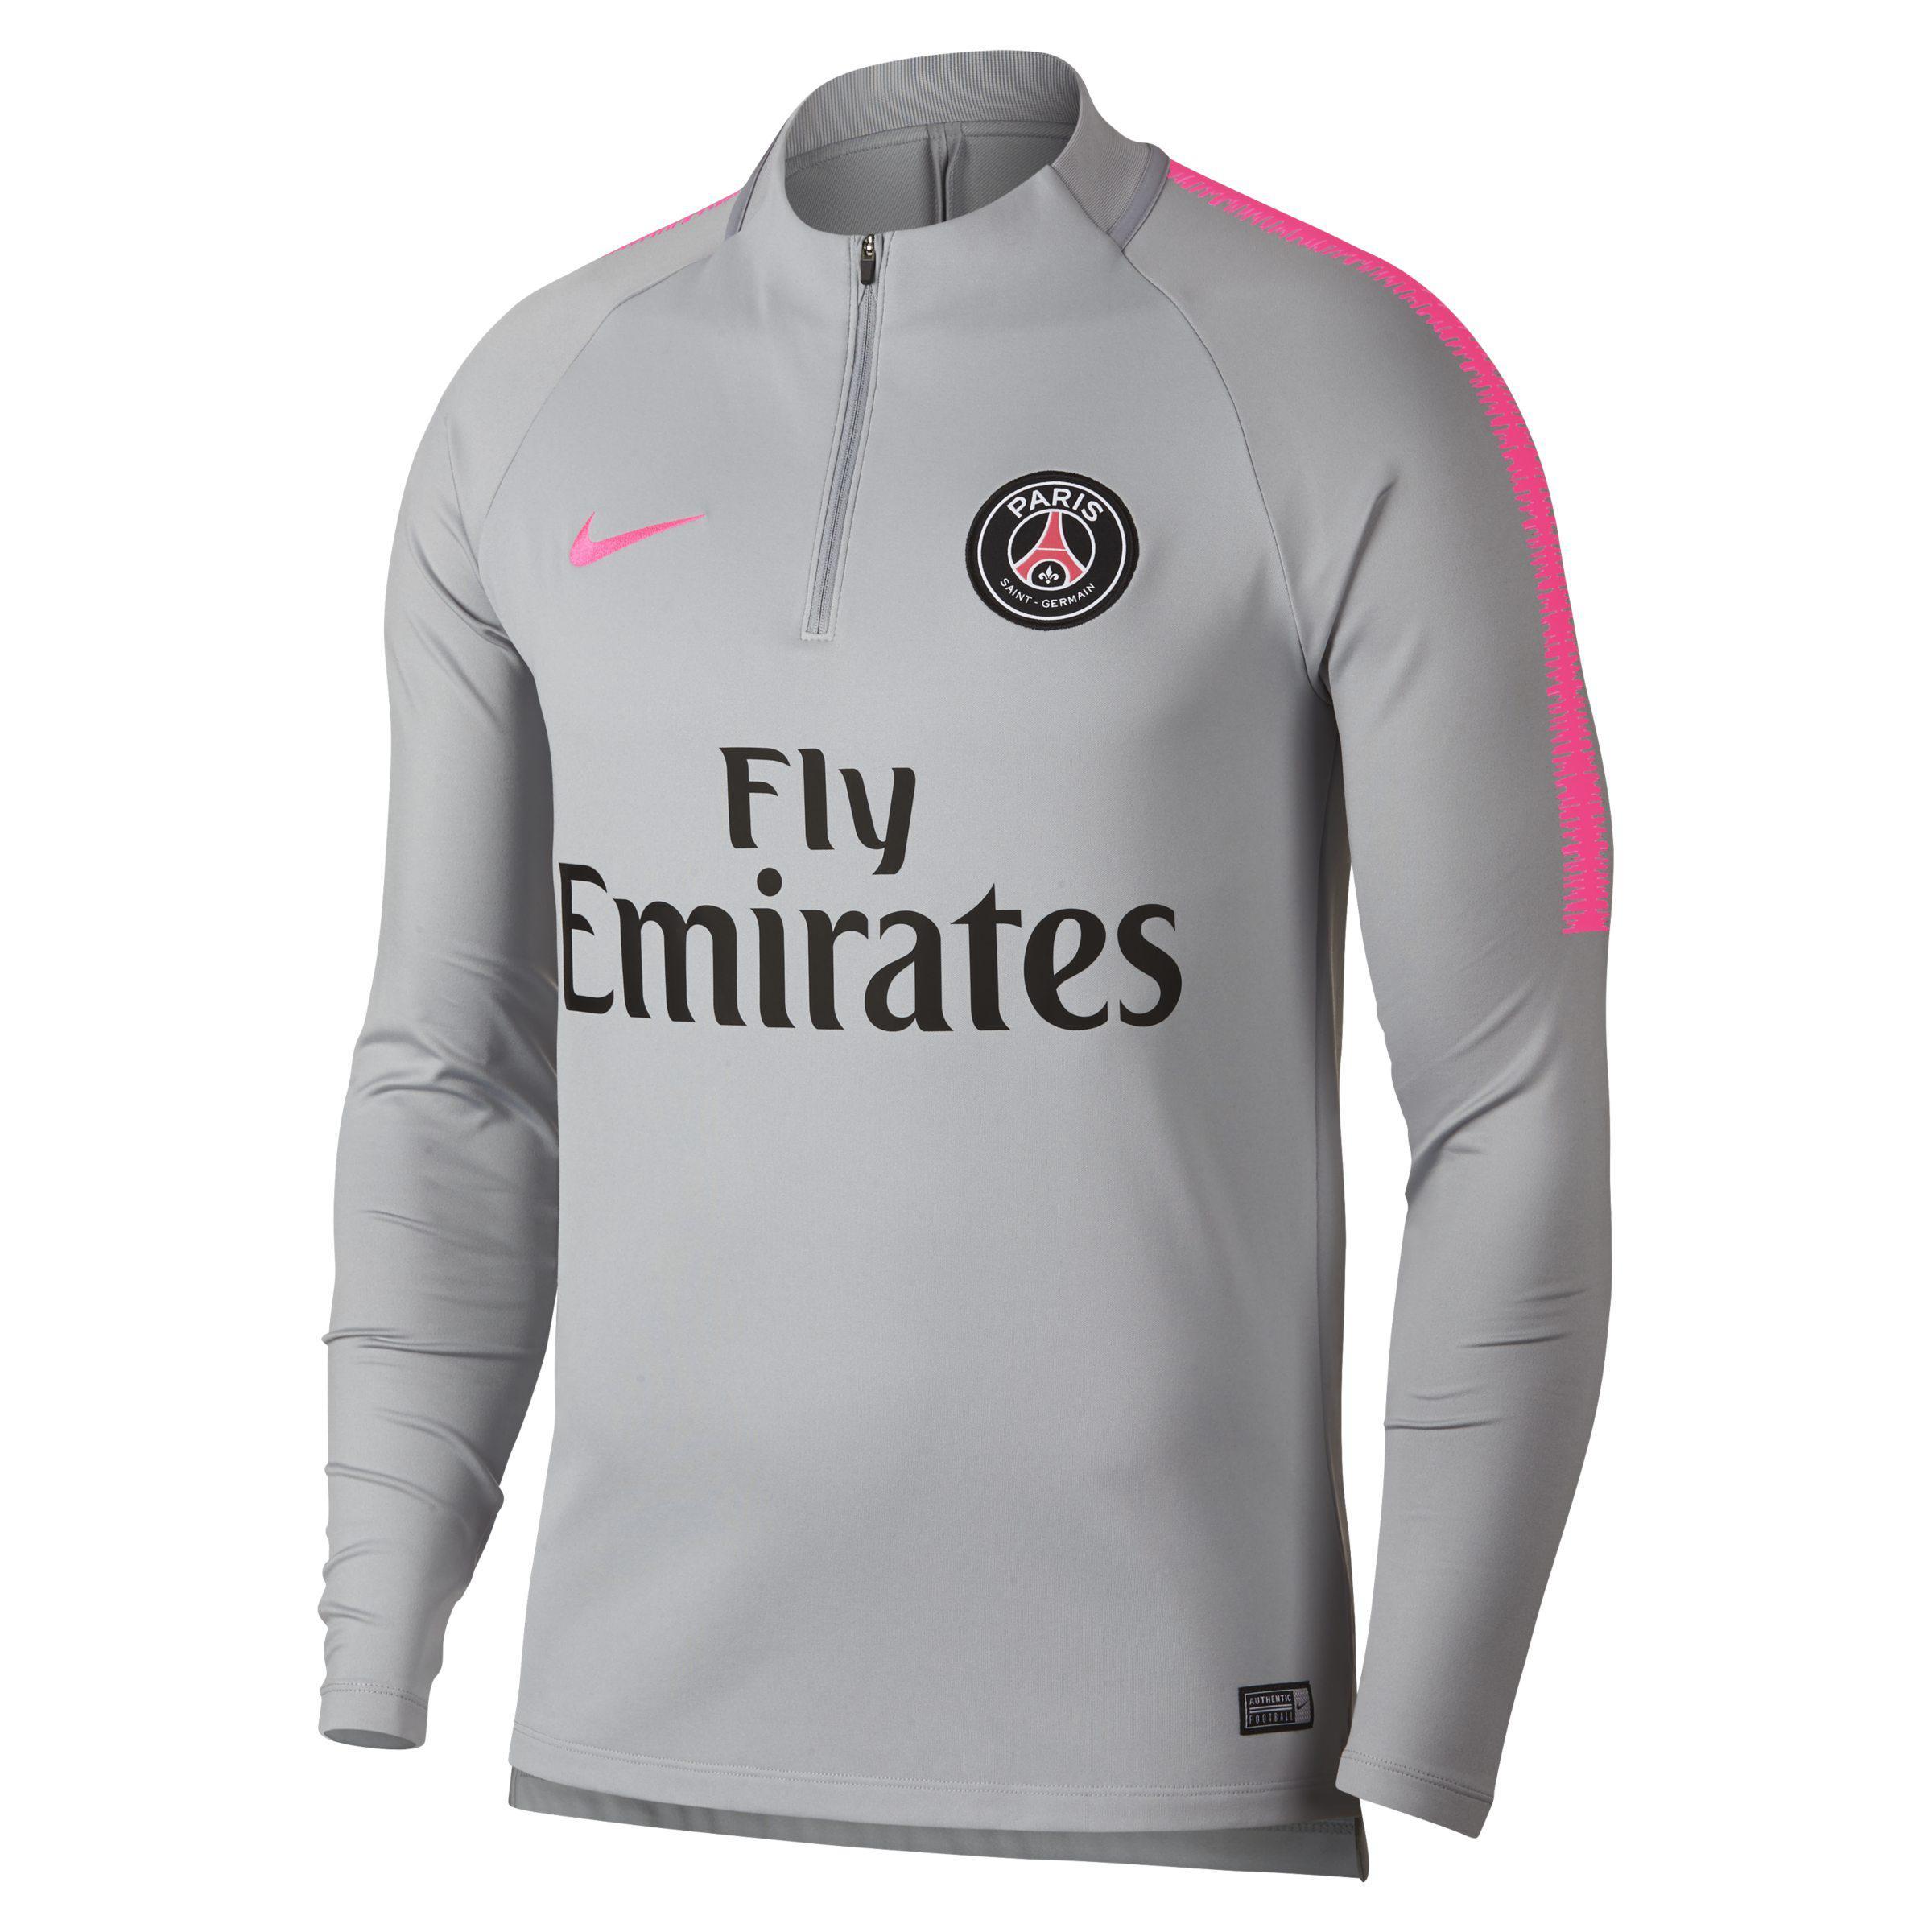 89884120c Nike Paris Saintgermain Drifit Squad Drill Men s Sweatshirt In Grey ...